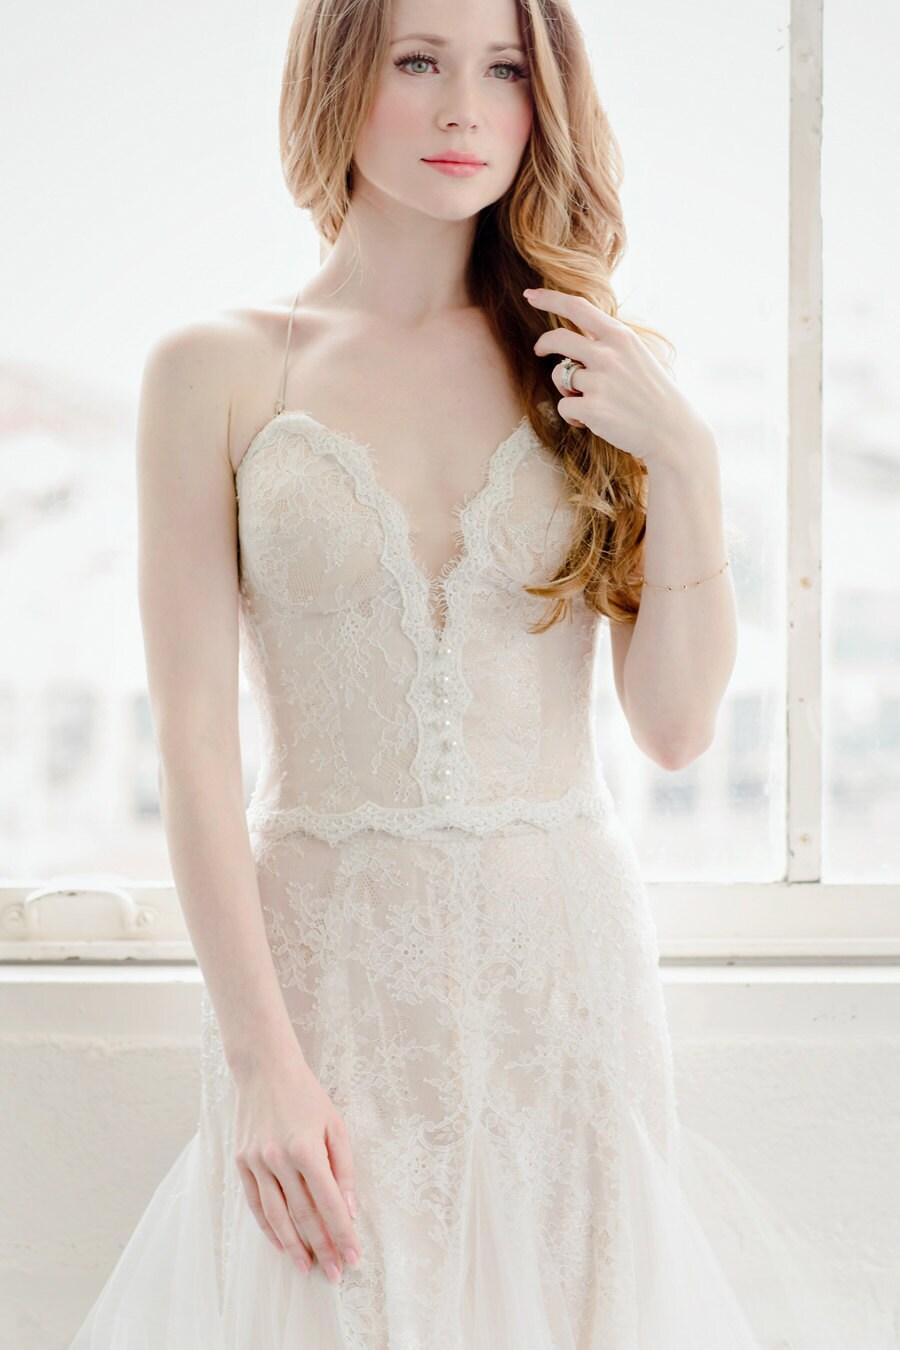 Rückenfreie Hochzeit sexy Korsett Braut Bustier-Top Spitze